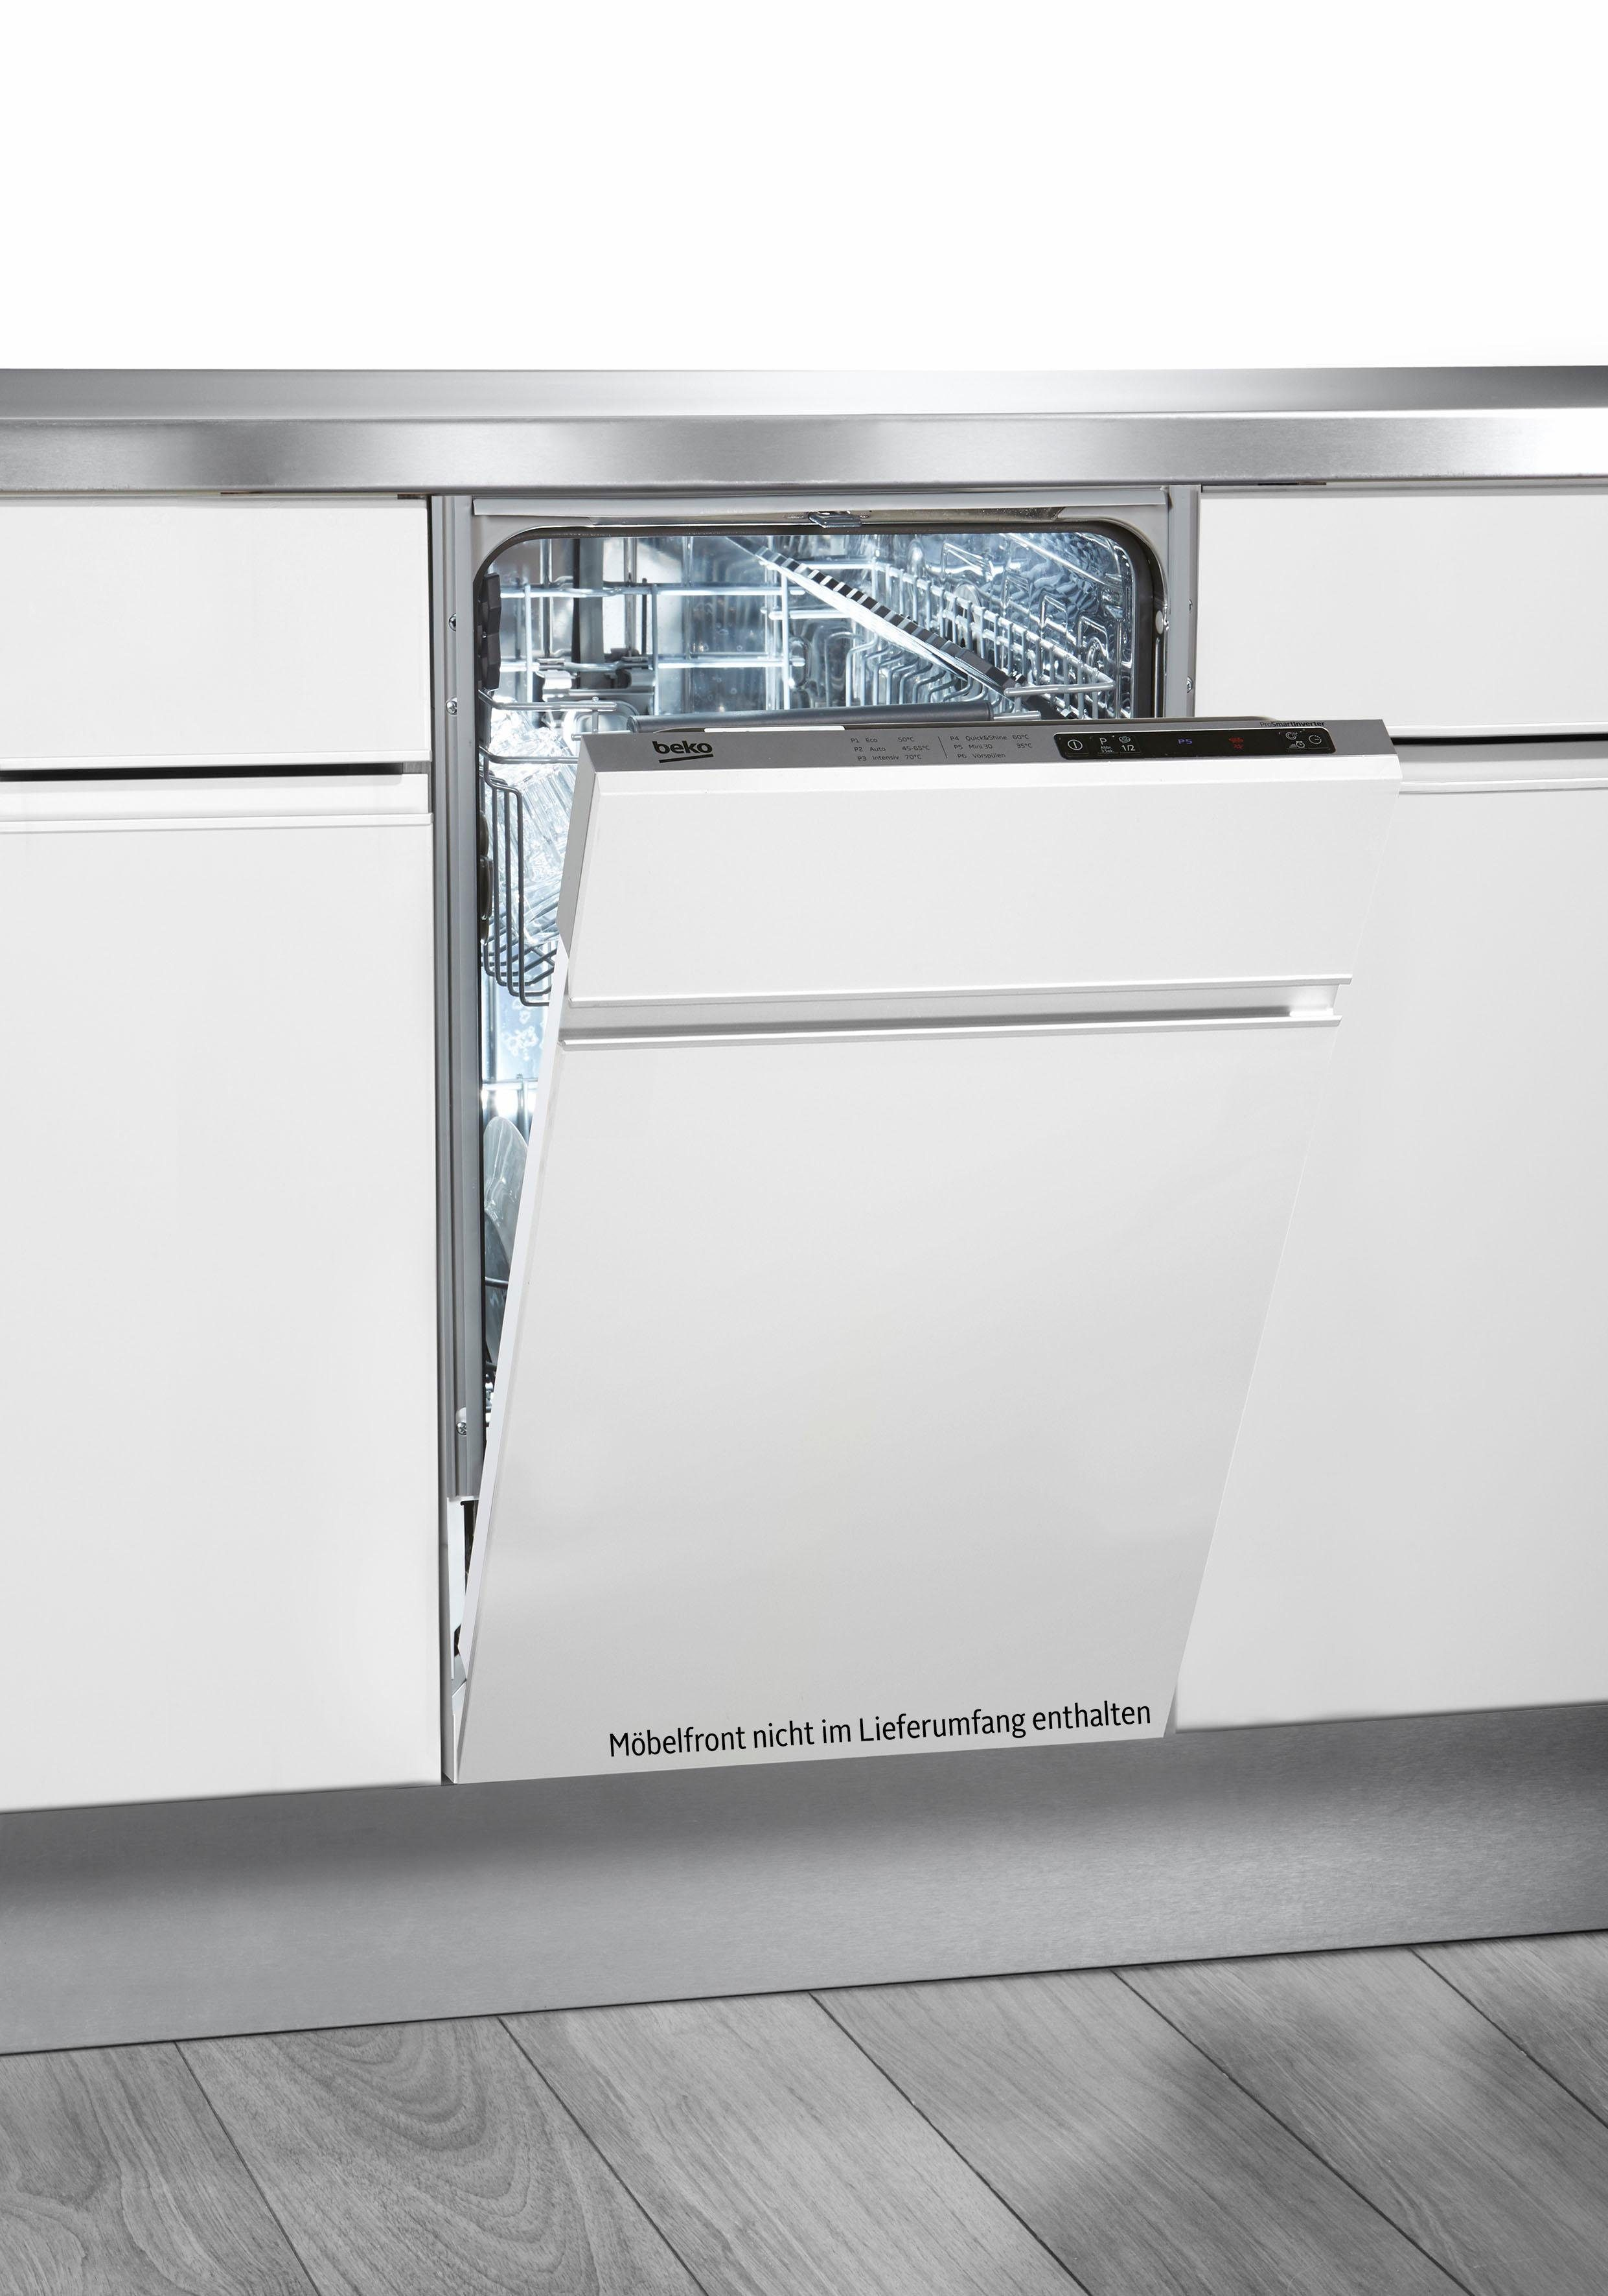 BEKO vollintegrierbarer Geschirrspüler, DIS16010, 10 l, 10 Maßgedecke, Energieeffizienzklasse A+